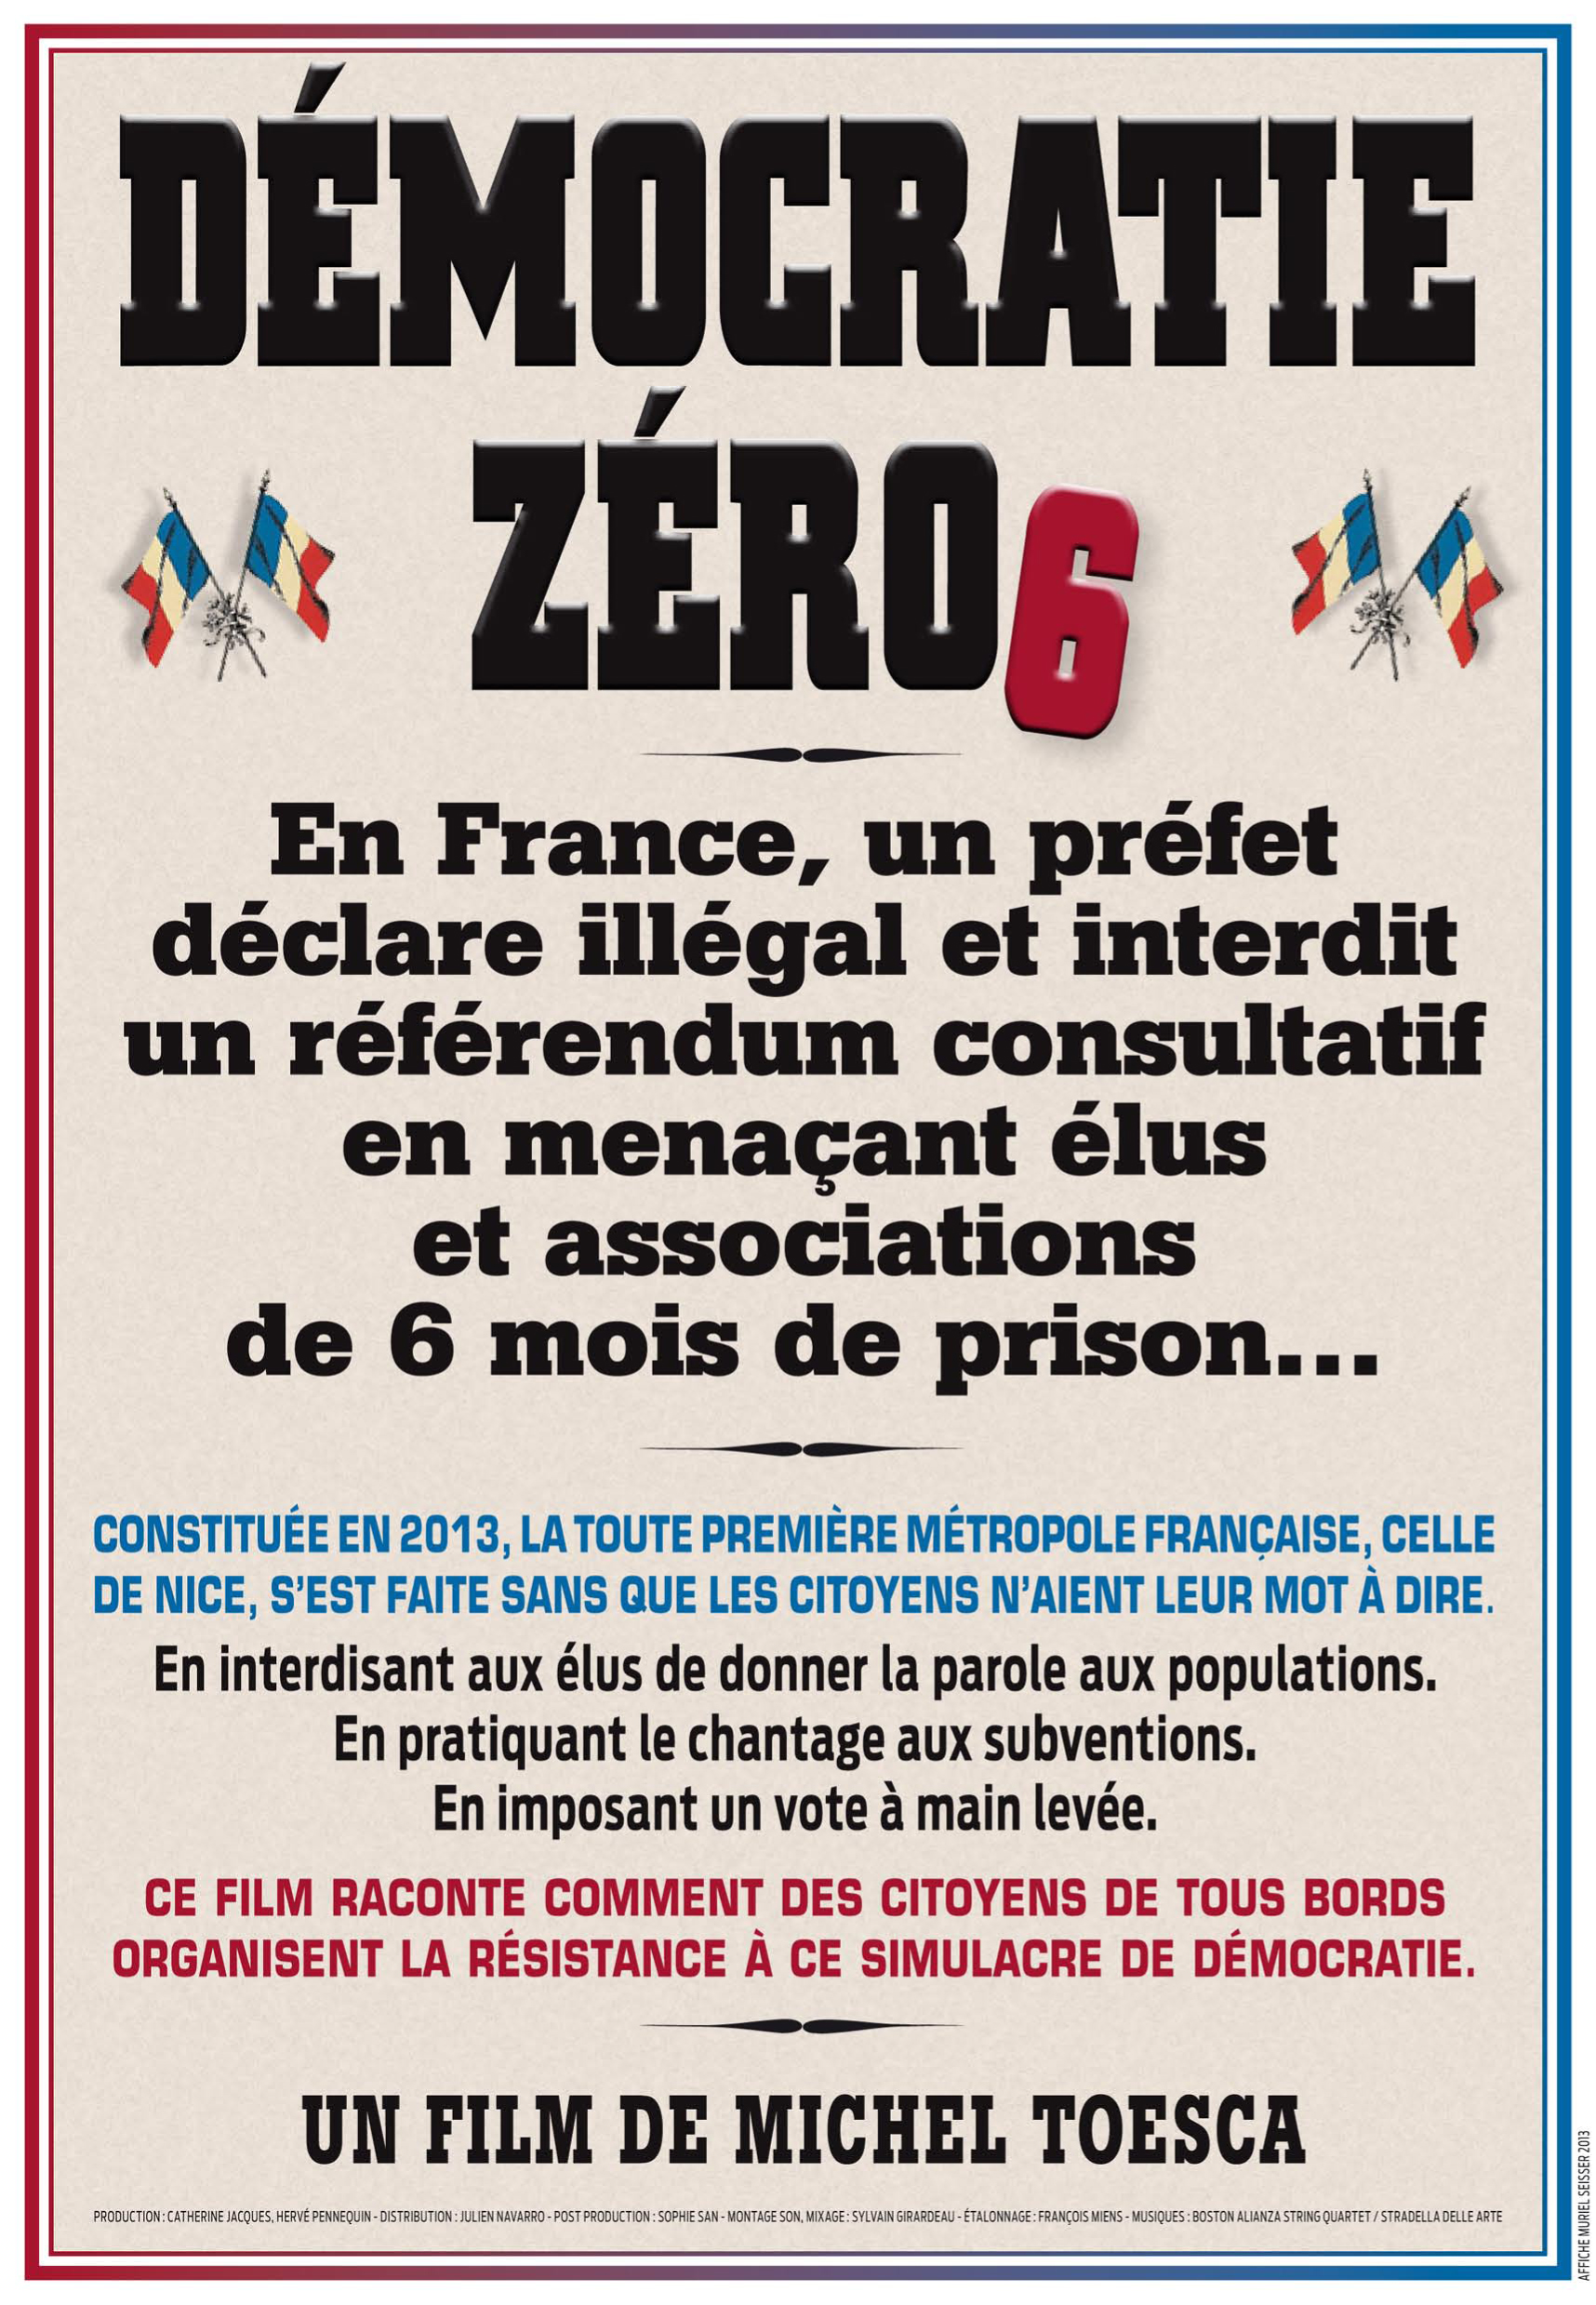 Démocratie Zéro6 -Magazine Nexus